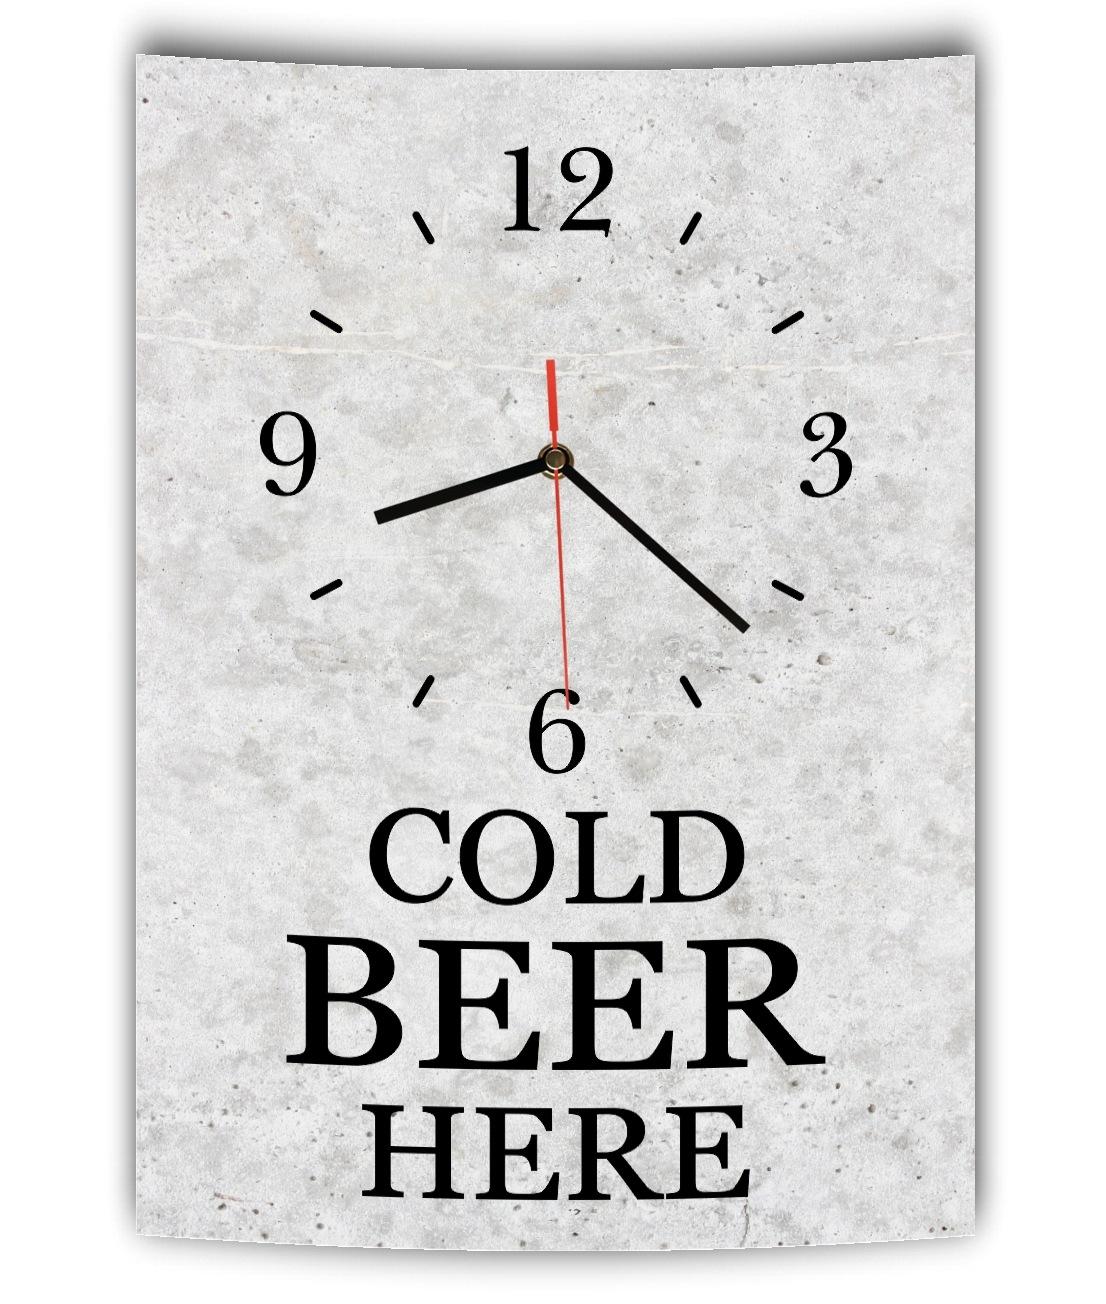 lautlose designer wanduhr mit spruch cold beer here grau betonoptik